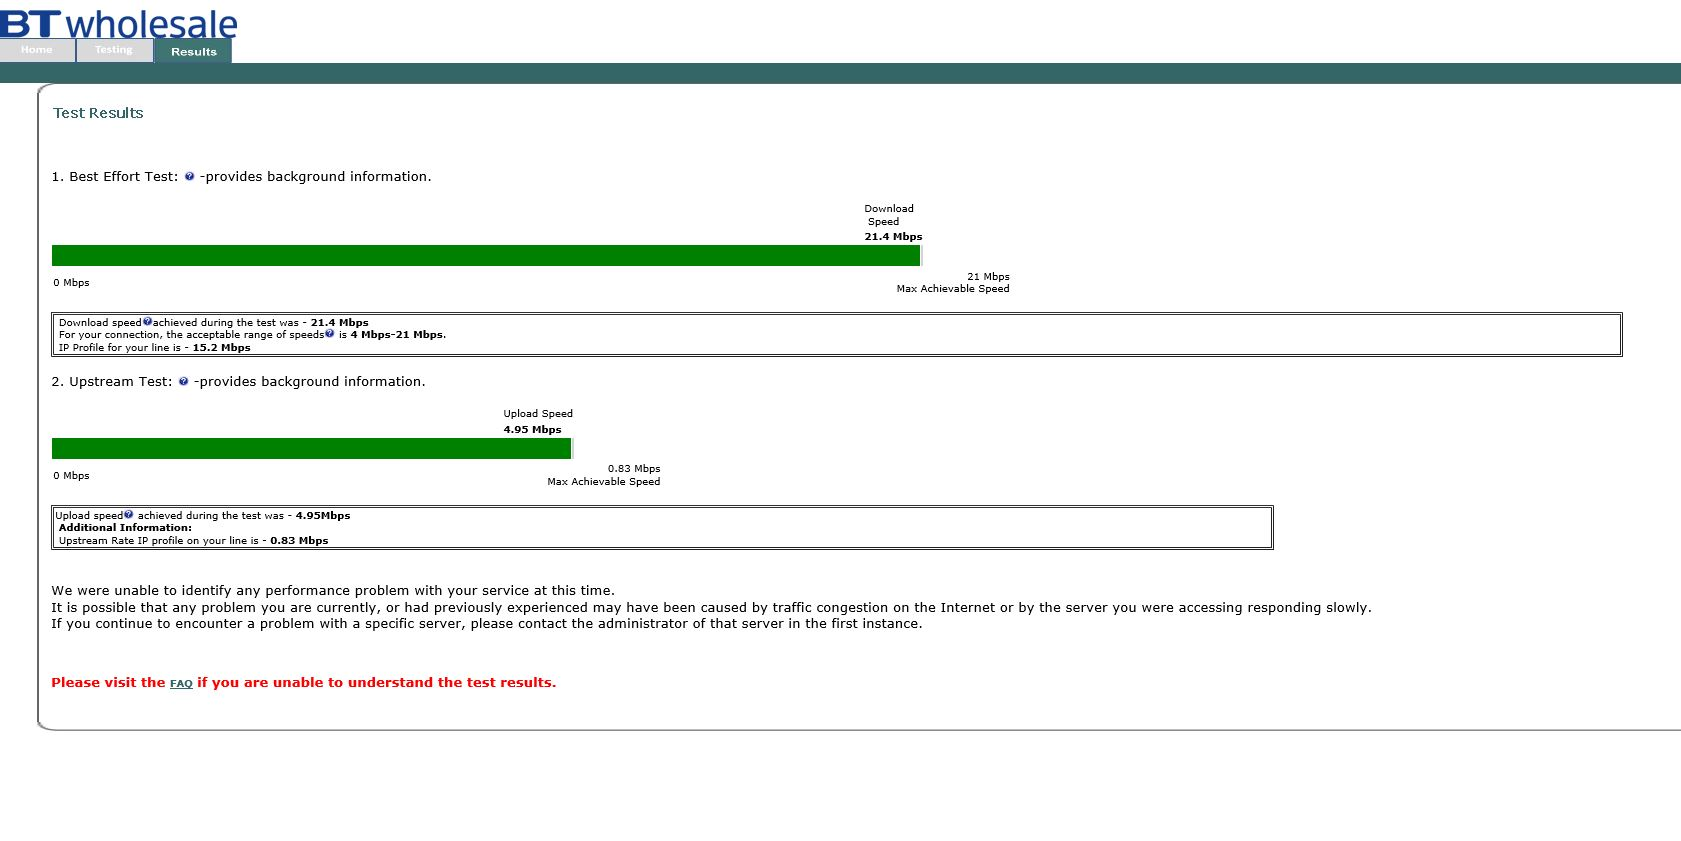 BT Wholesale diagnostics screen capture 310pm.JPG